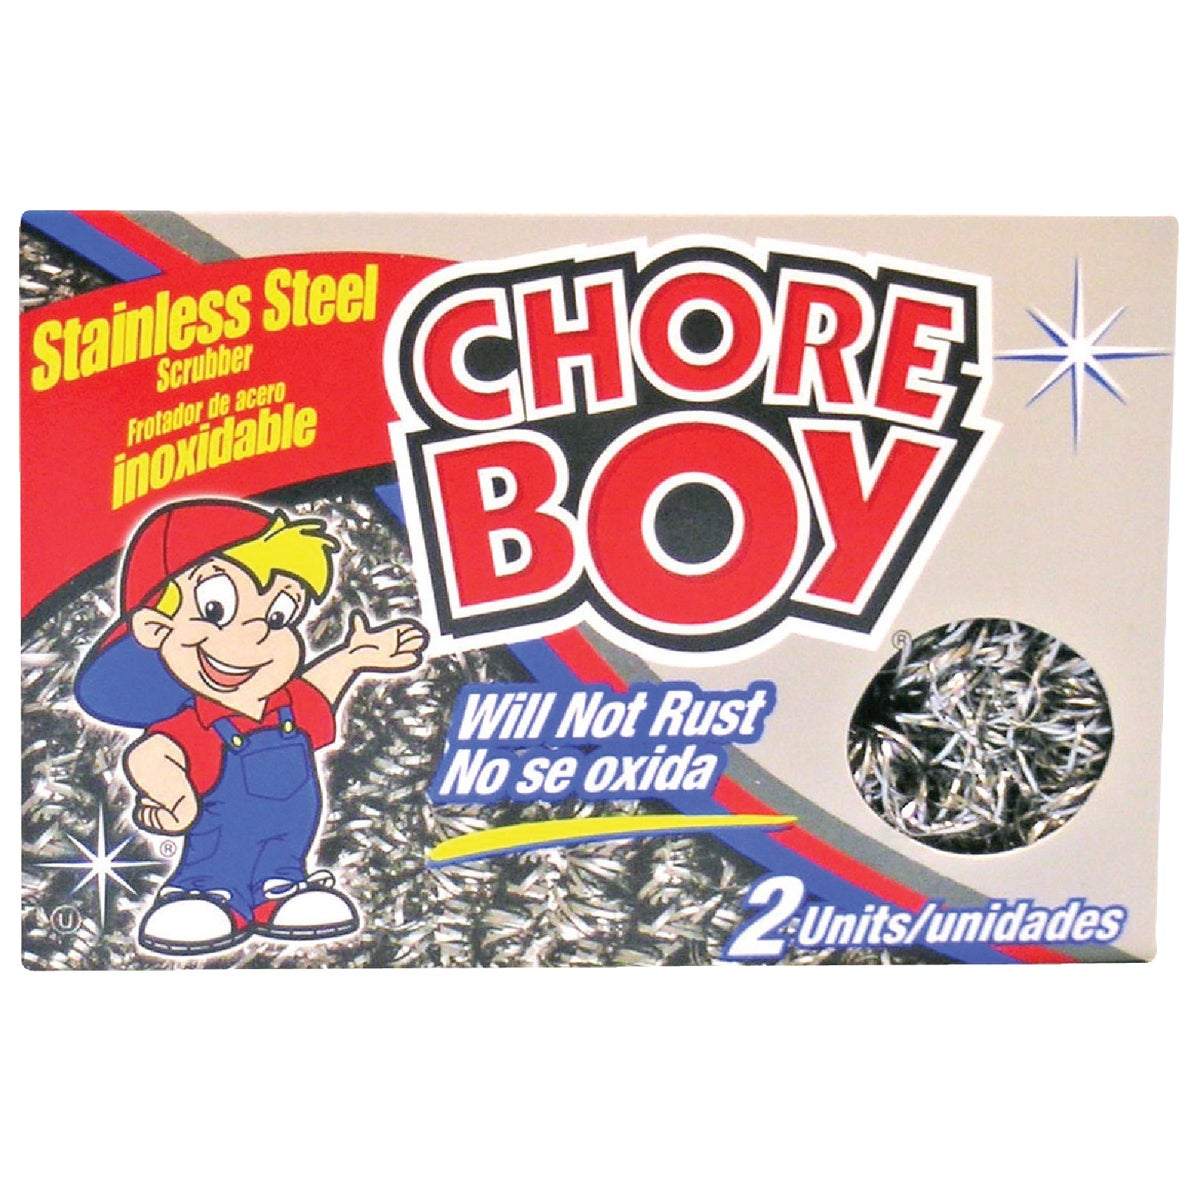 Spic & Span SS CHORE BOY 218